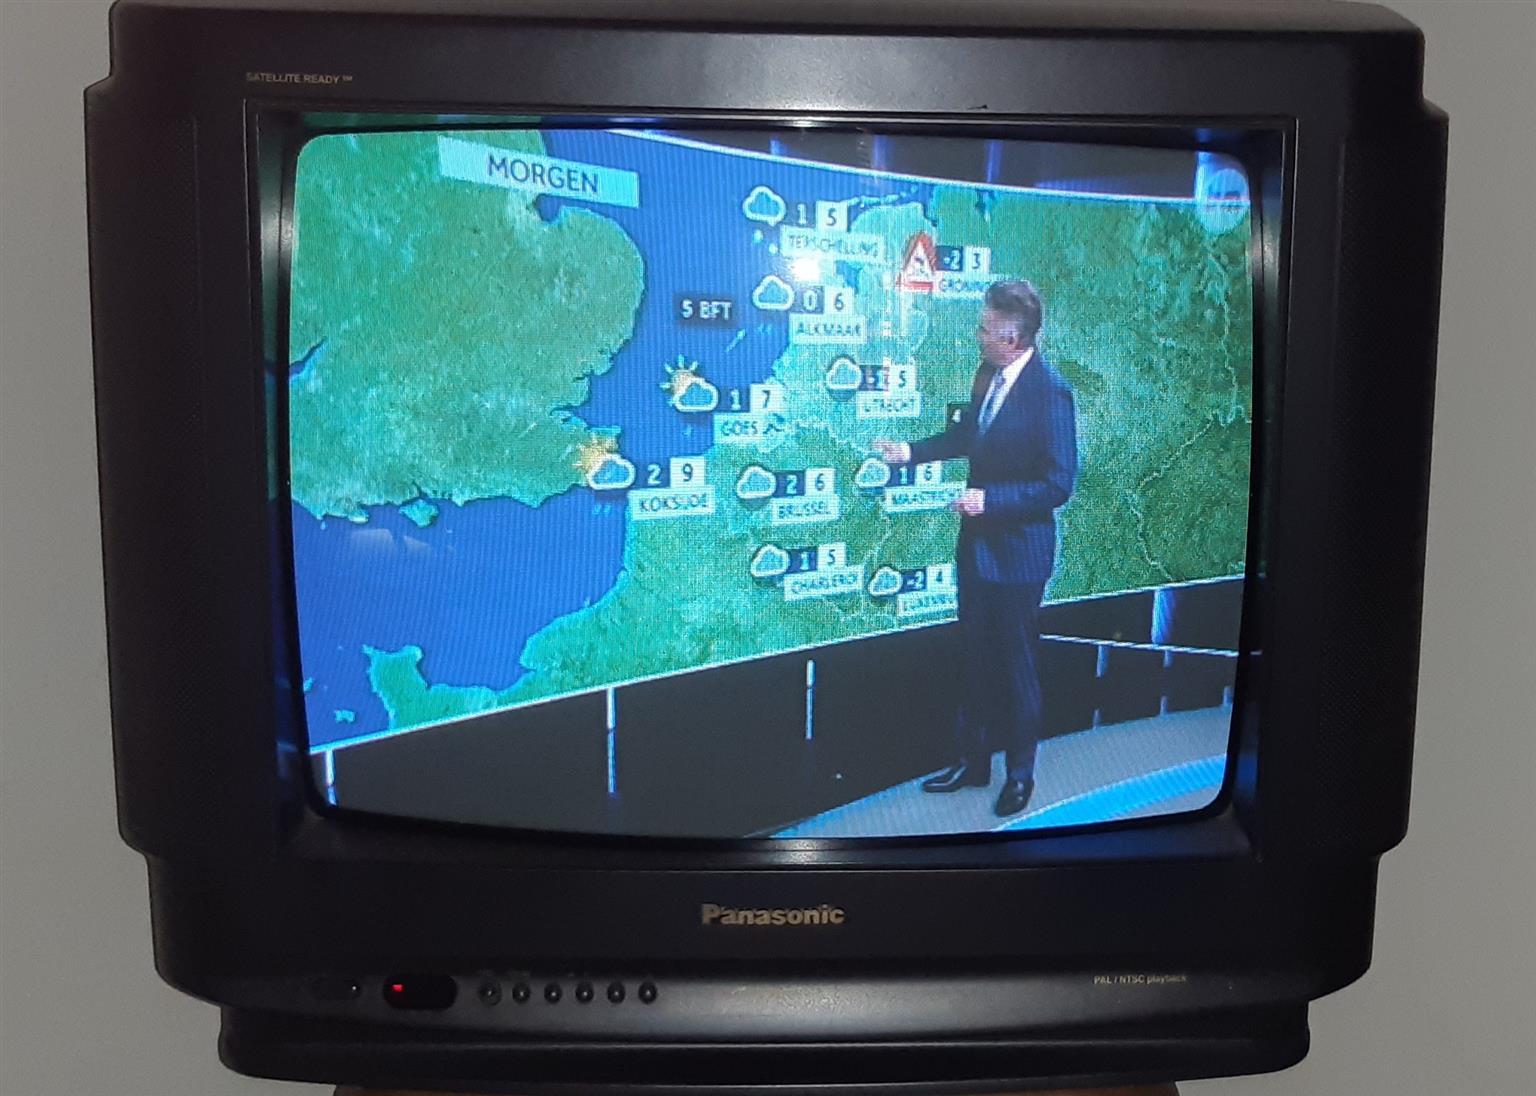 Panasonic TV - 51 cm - model FX51 (old box type)